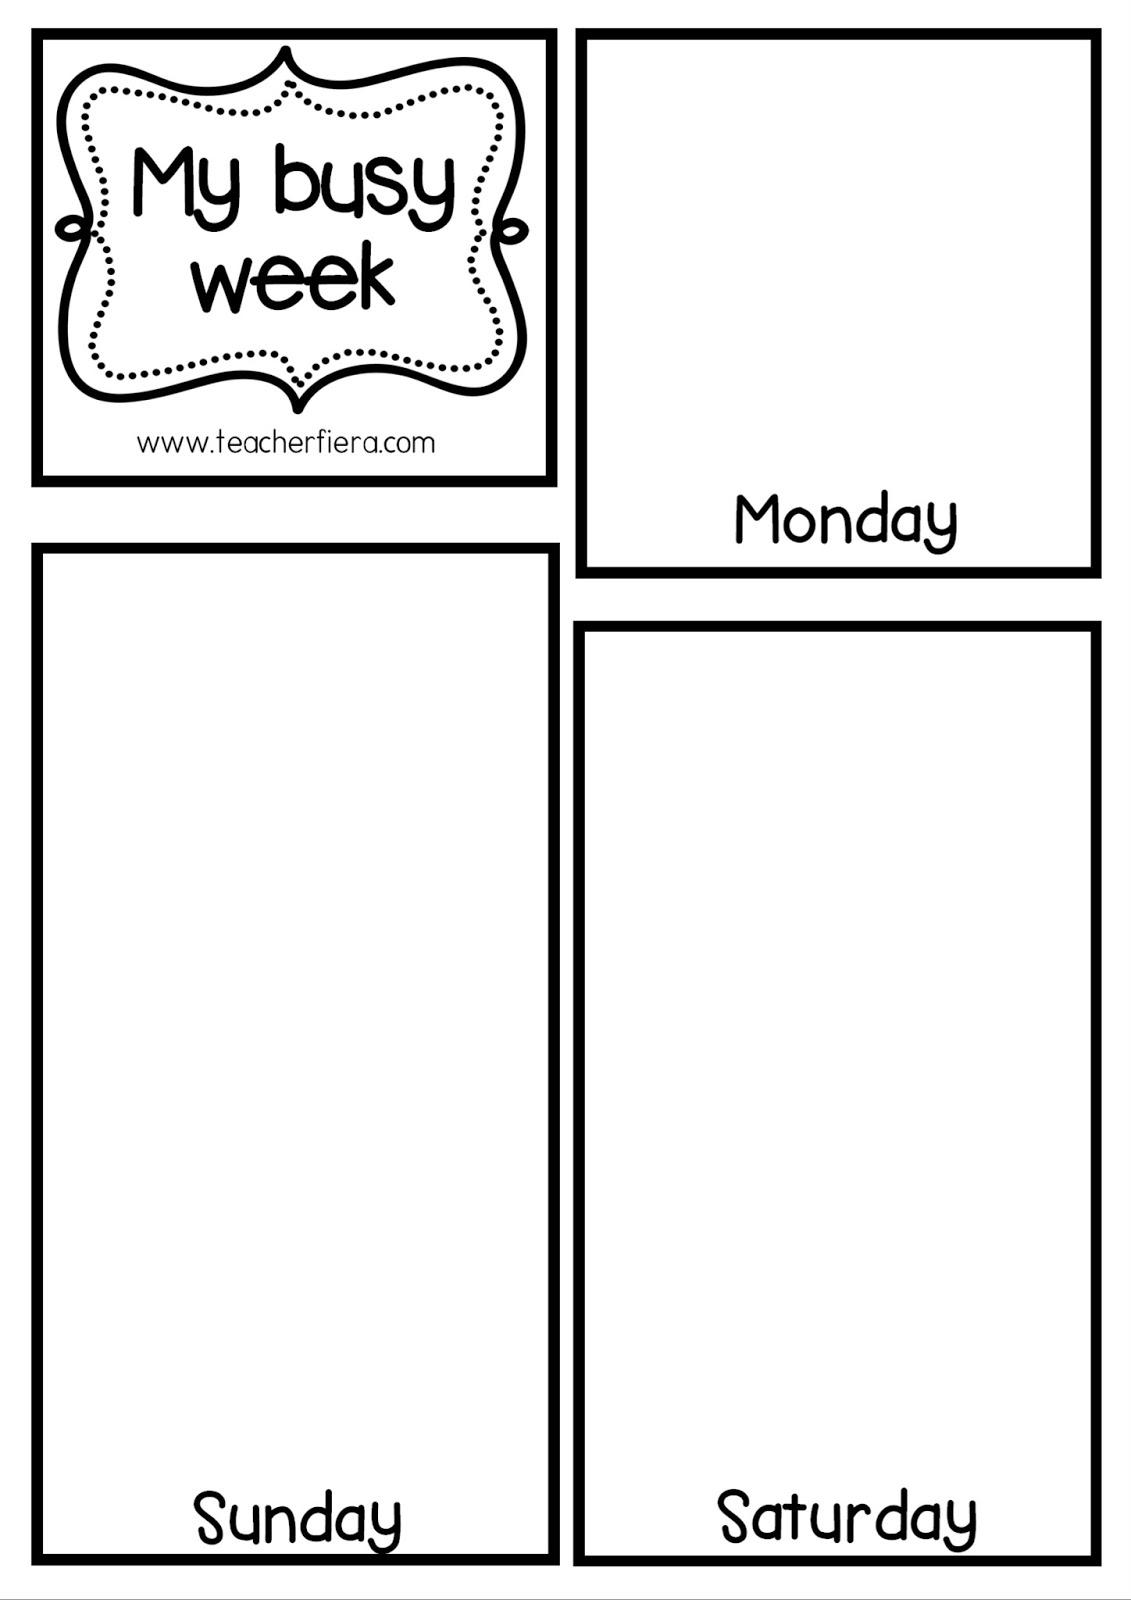 Teacherfiera My Busy Week Flip Book Template Year 2 Unit 5